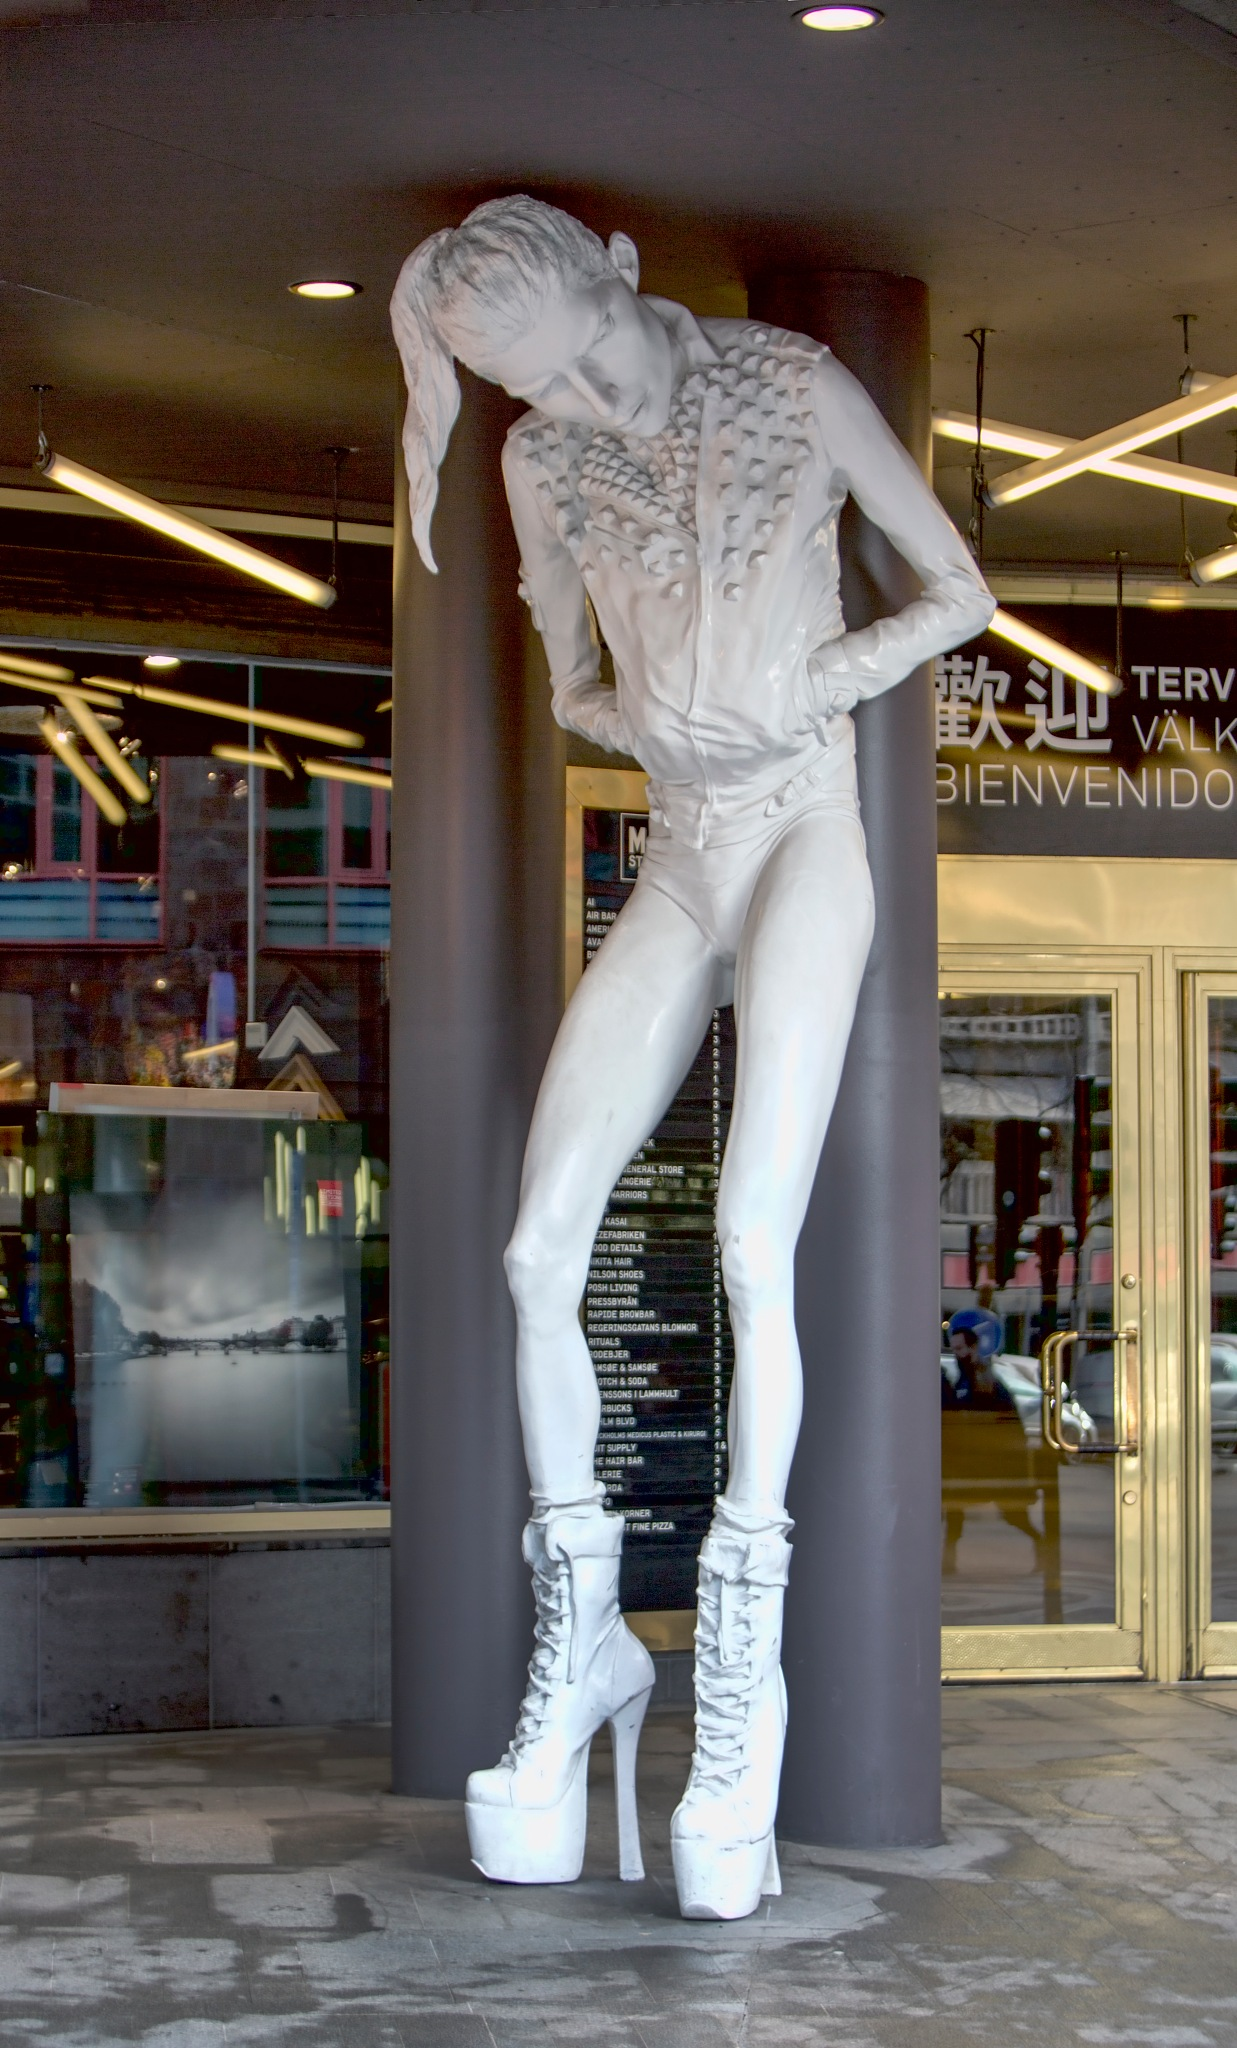 Photo in Cityscape #art #ppretty vacant #cajsa von zeipel #skulptur #canonfreak #ola sköld #stockholm city #konst #staty #nutidskonst #modern #kvinna